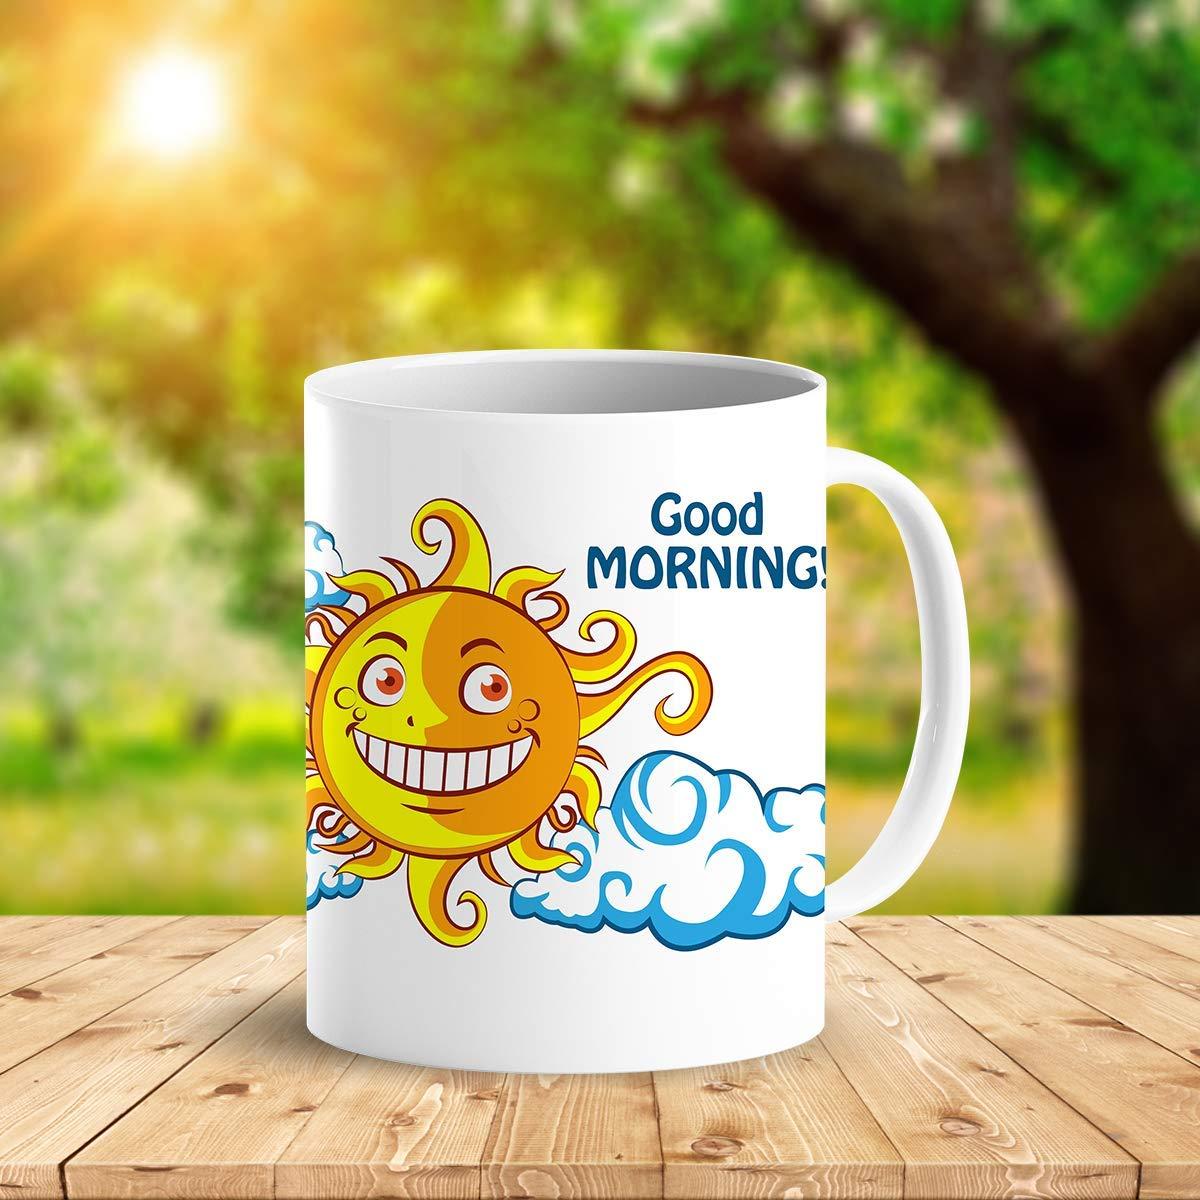 Heat Sensitive Color Changing Coffee Mug Funny Coffee Cup NightDay MoonSun Design Funny Gift Idea B07D223C62 2